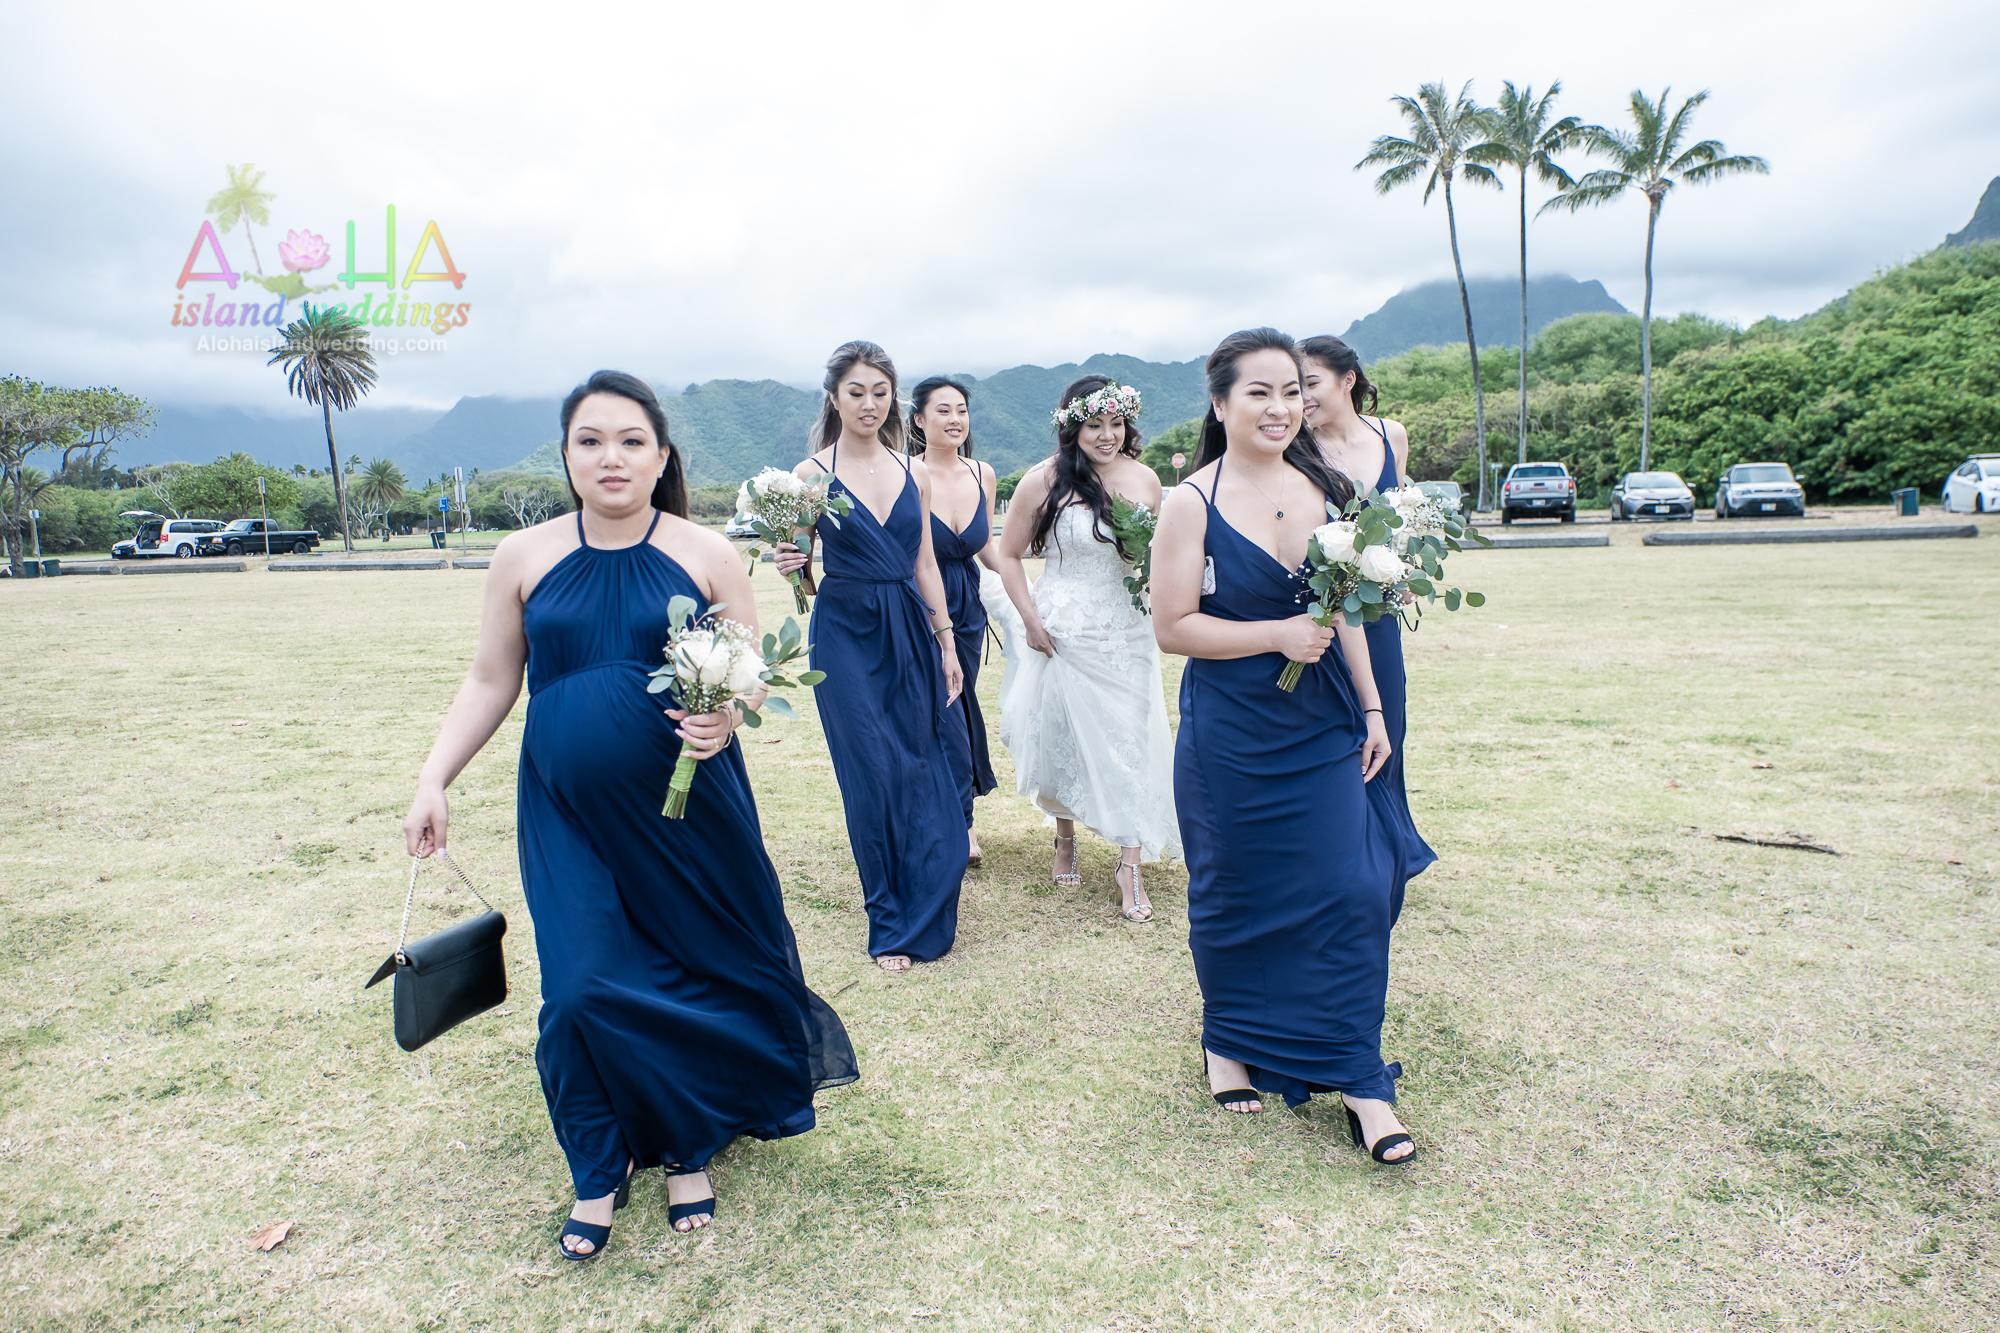 Hawaii weddings and events, Kualoa-322